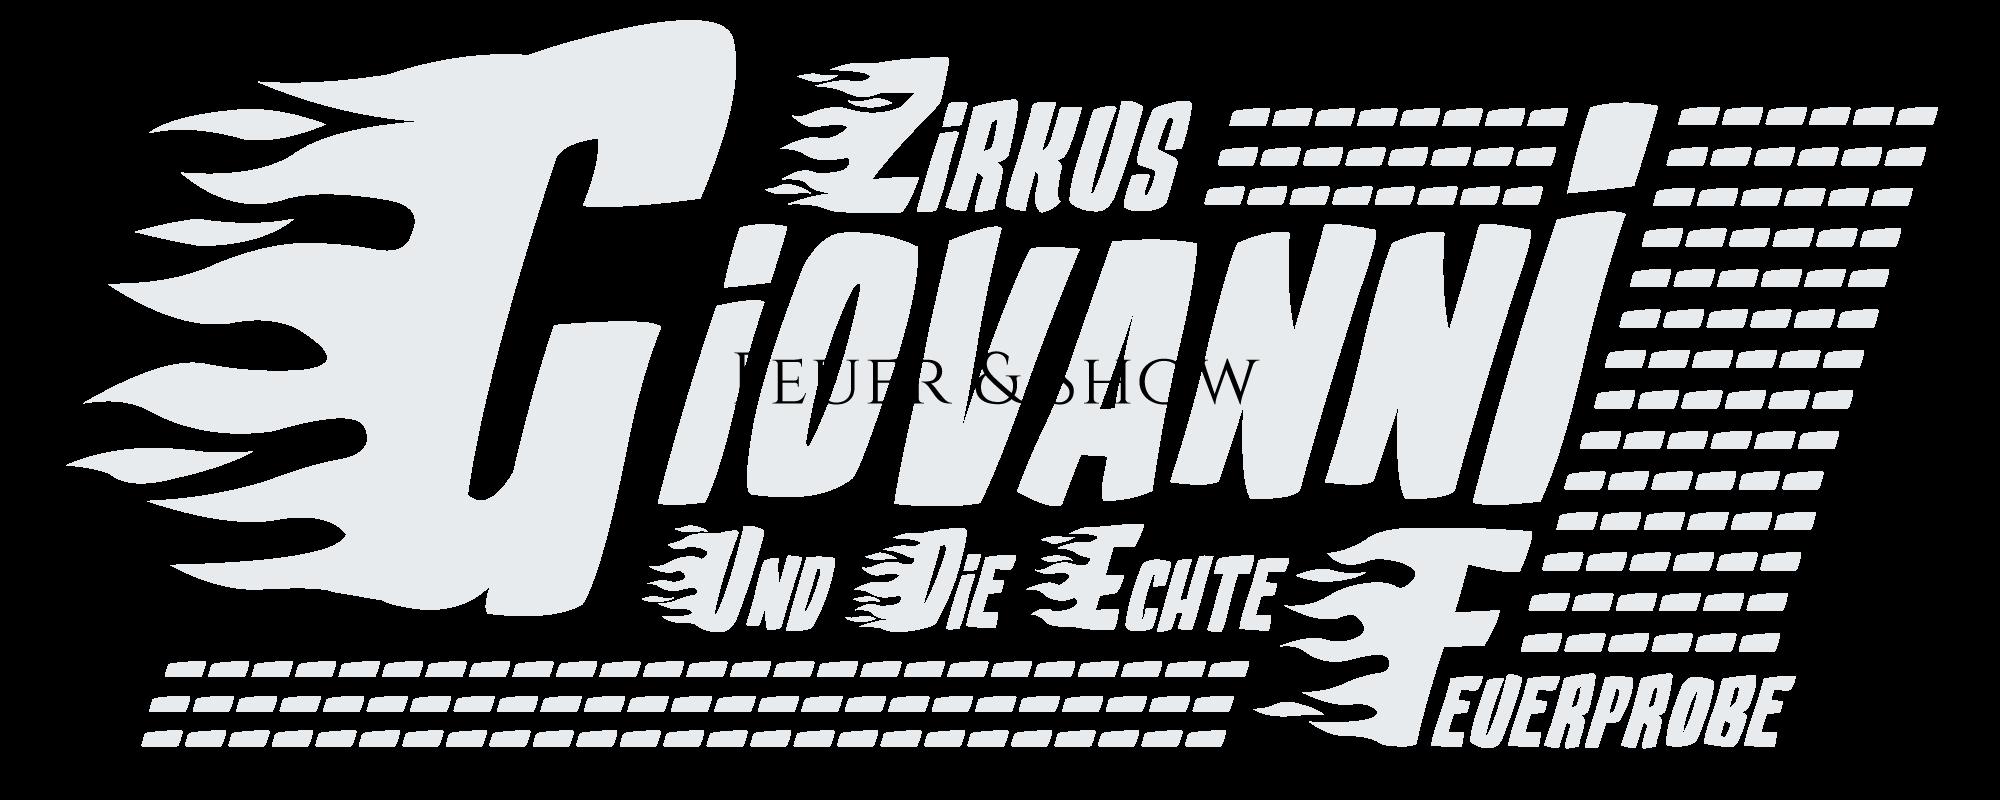 Feuer-Show-Typofield-Zirkus-Giovanni-Bamberg